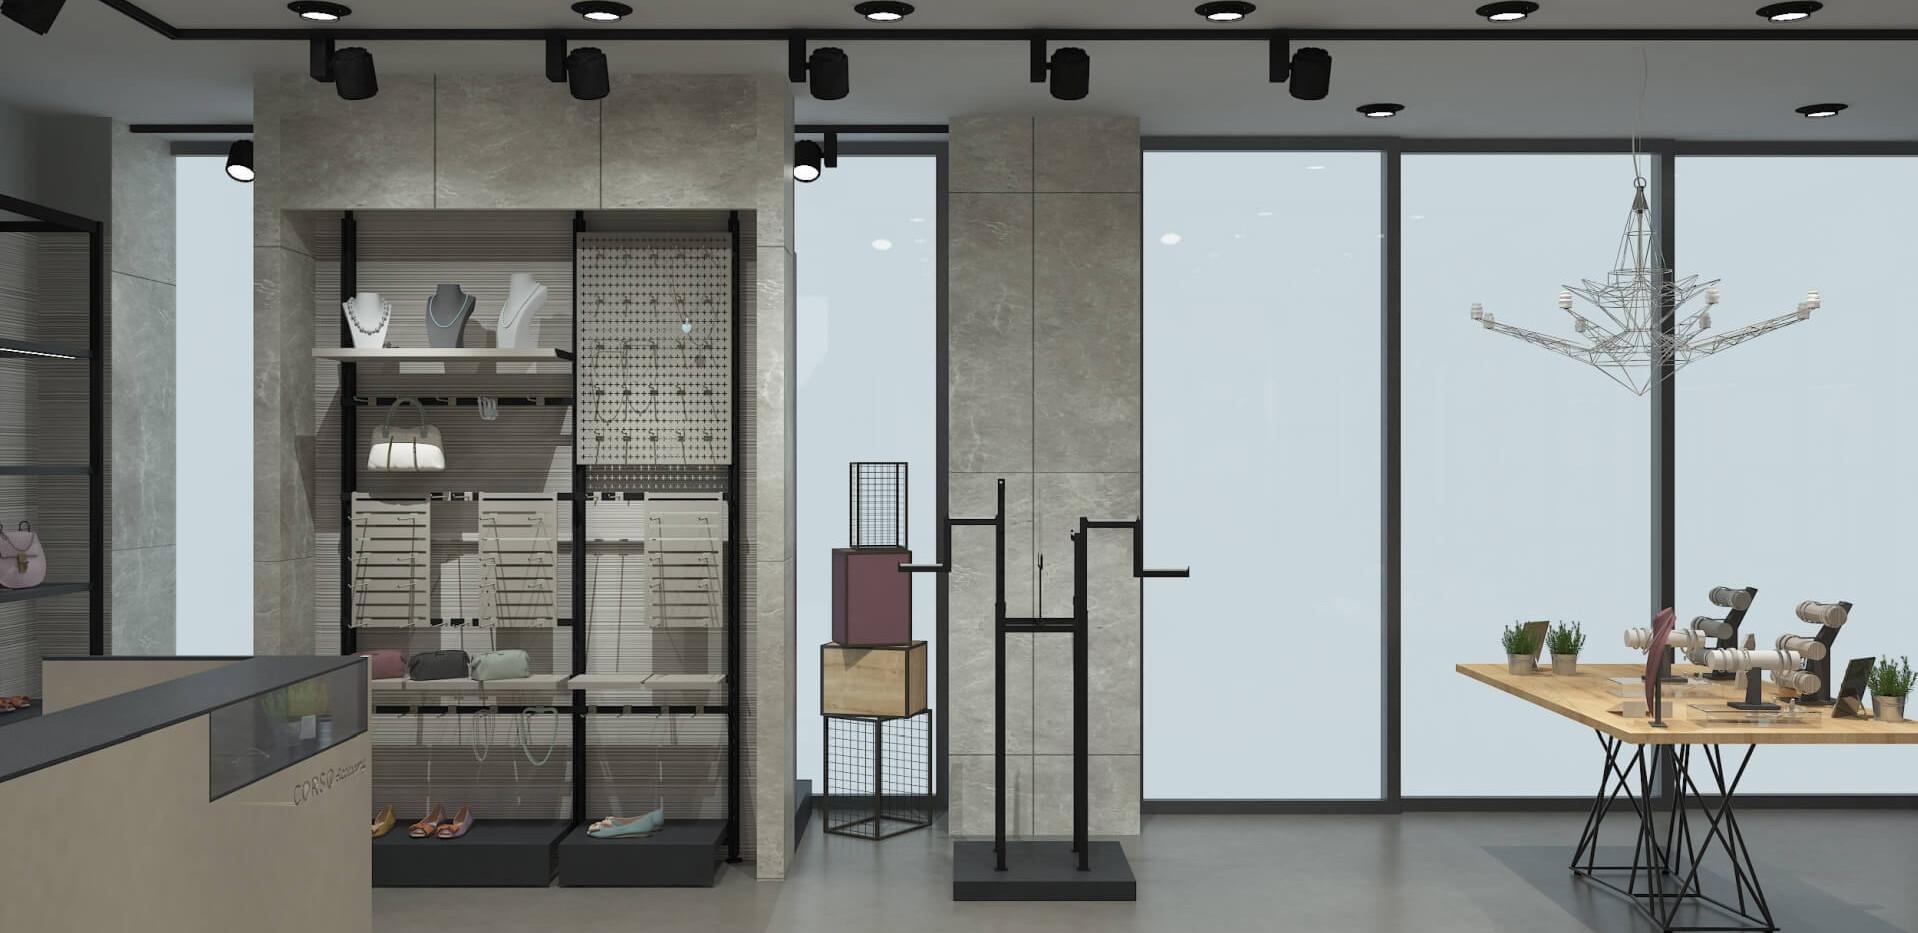 Corso - Shoes Store Shop Design-3.jpg